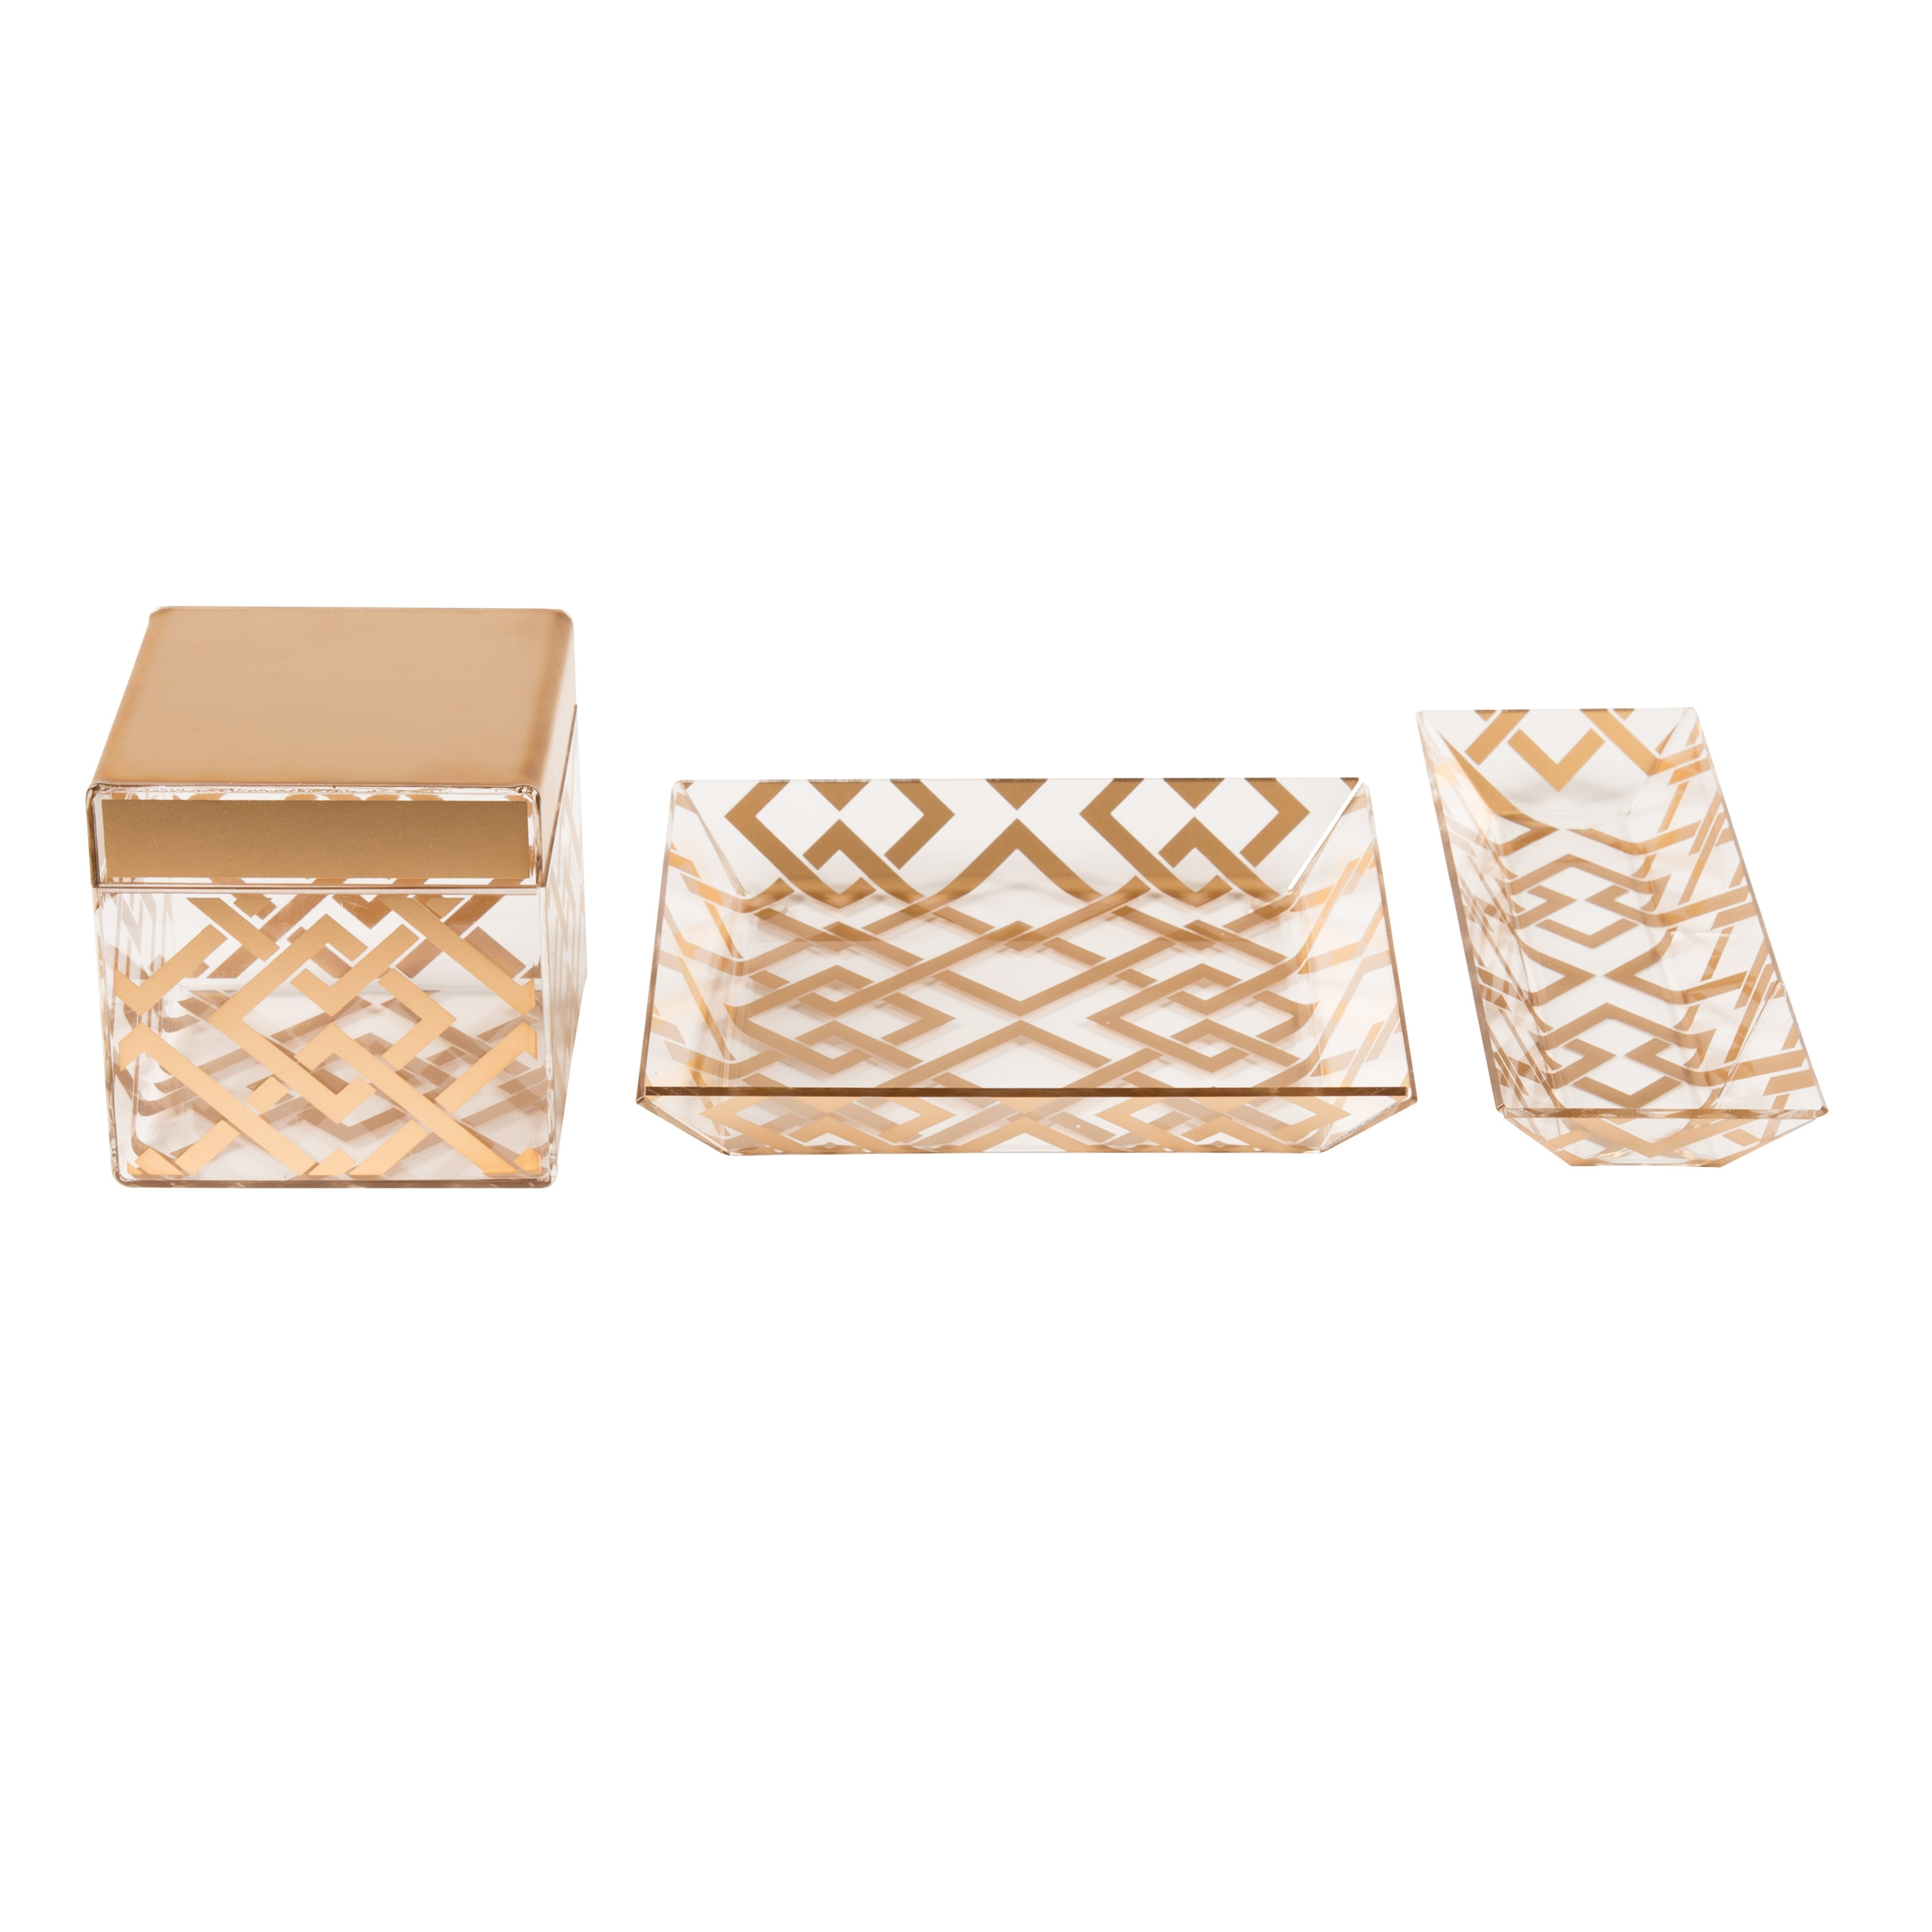 Vanity Organizer / Gold Luxe Lattice 3 Piece Acrylic Desk Set, Gold 0